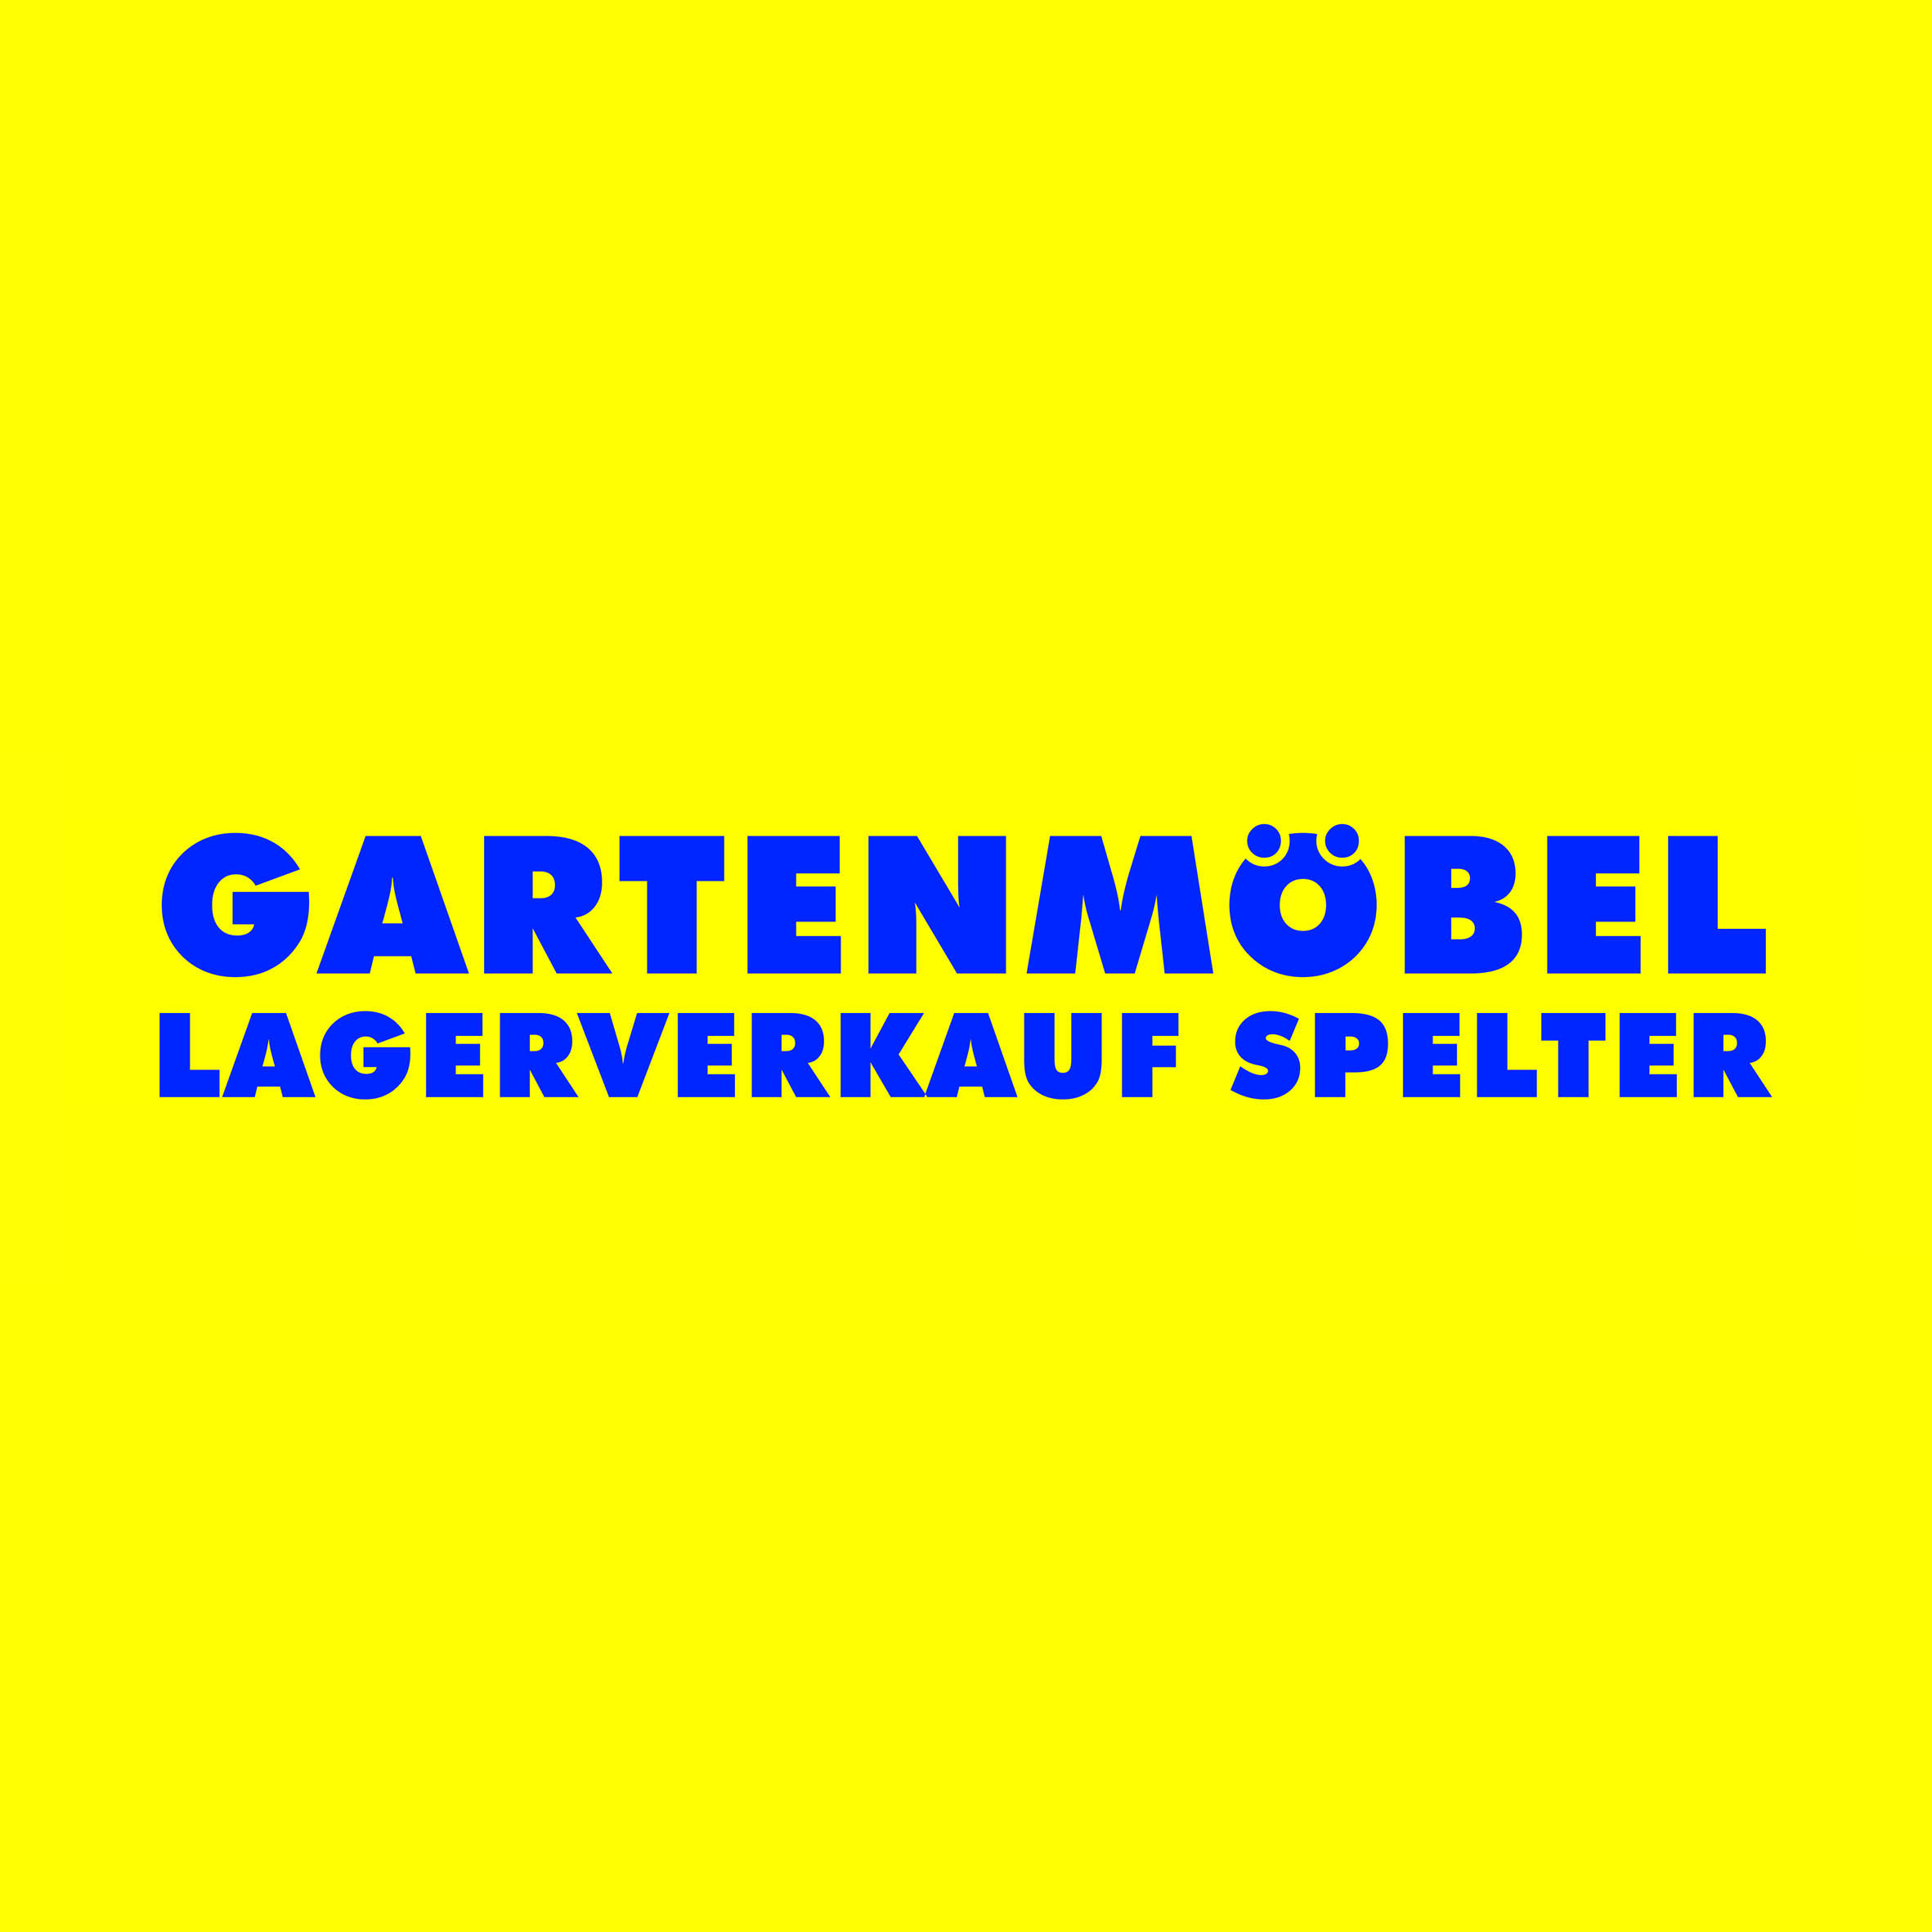 Gartenmöbel Lagerverkauf Spelter in Neuss Hoisten